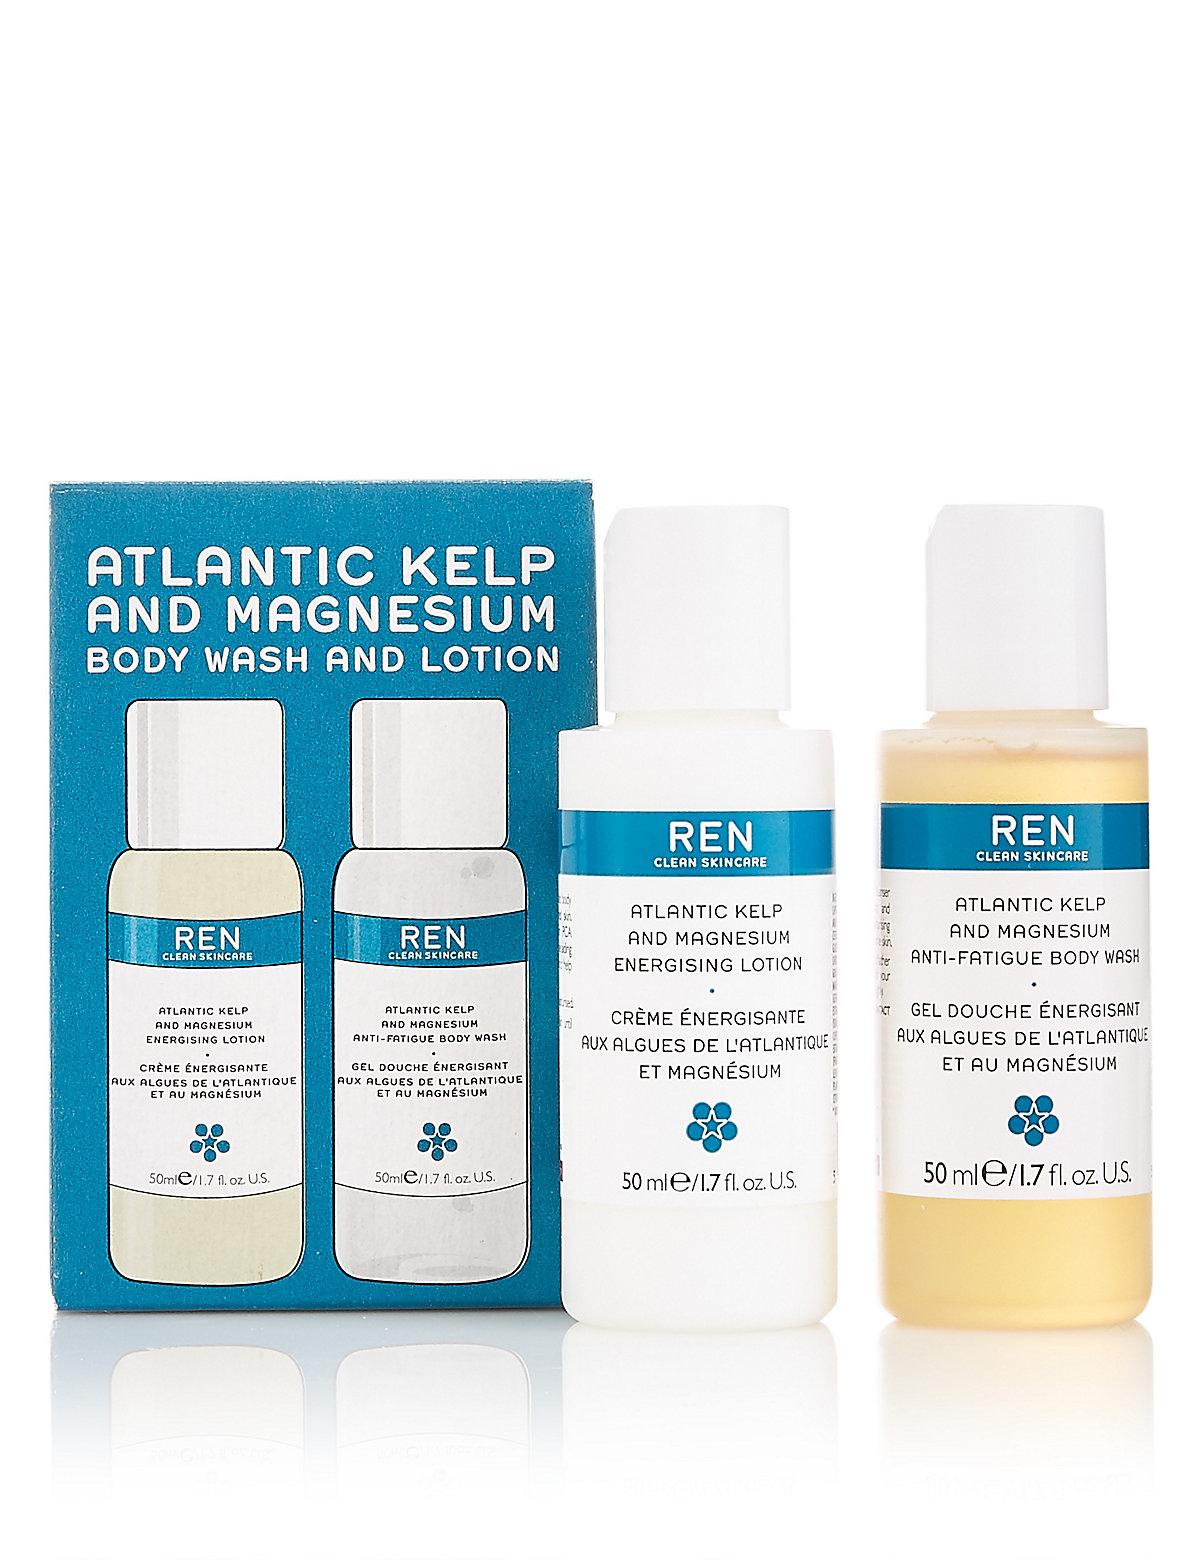 REN Atlan Kelp Mag Mini Body Duo Kit